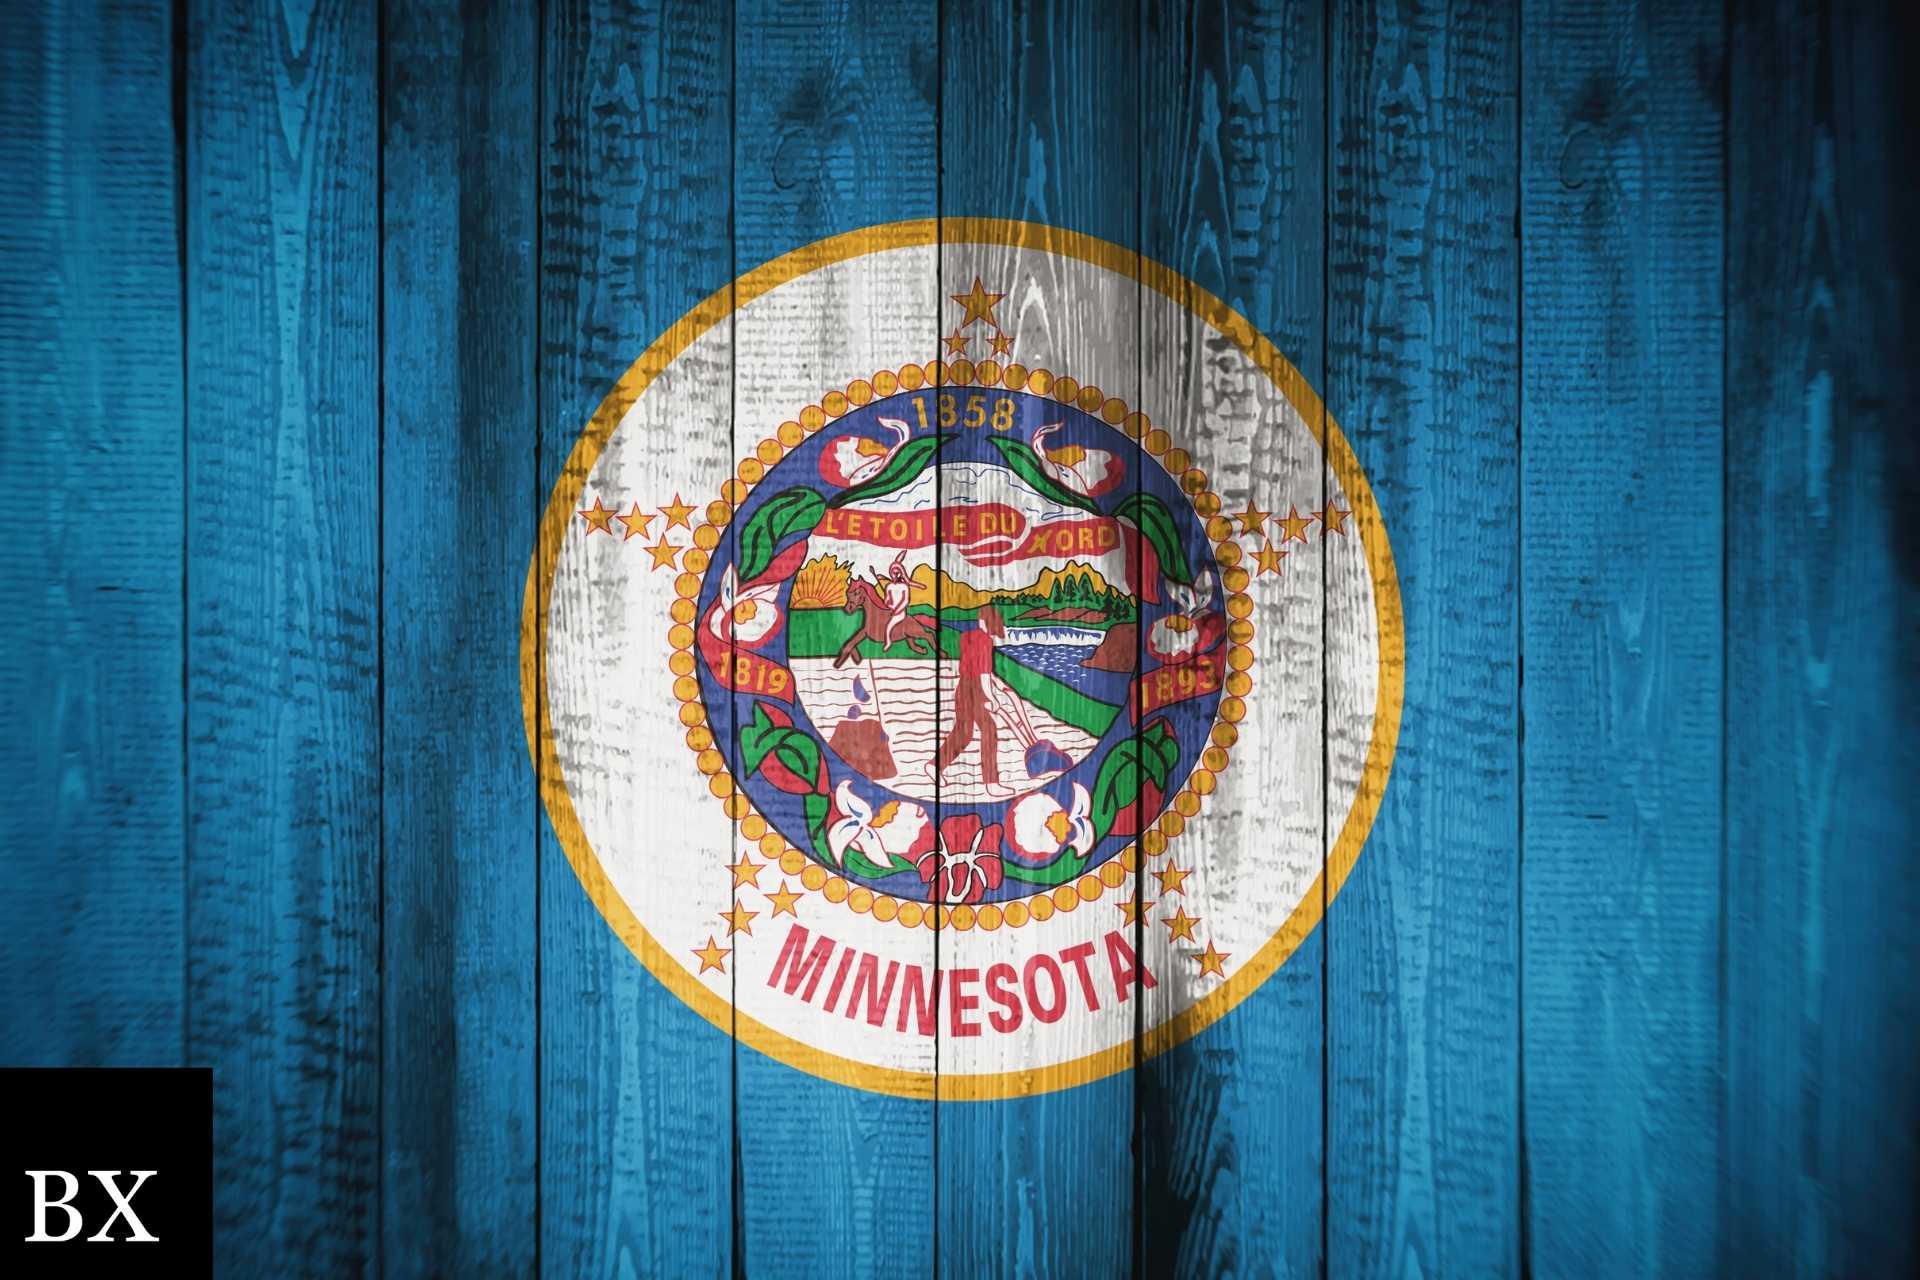 Minnesota Contractor High Pressure Piping Bond